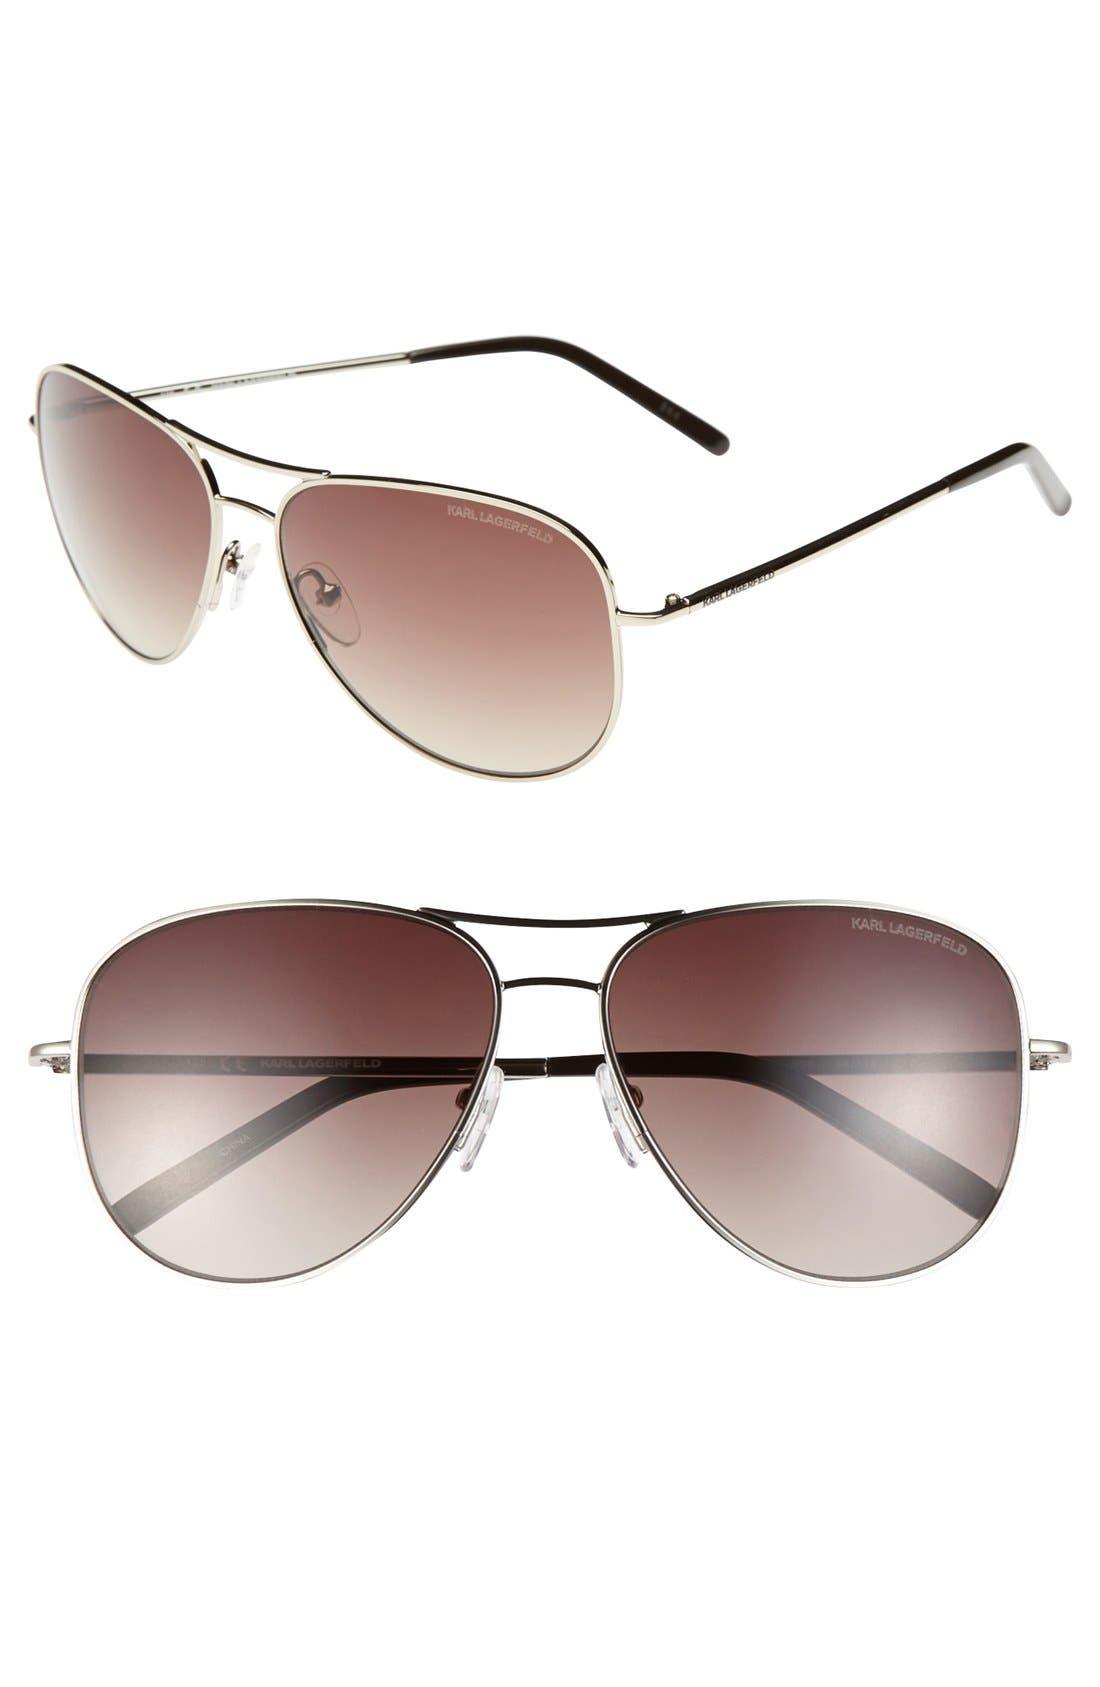 Karl Lagerfeld 58mm Metal Aviator Sunglasses,                             Main thumbnail 1, color,                             040